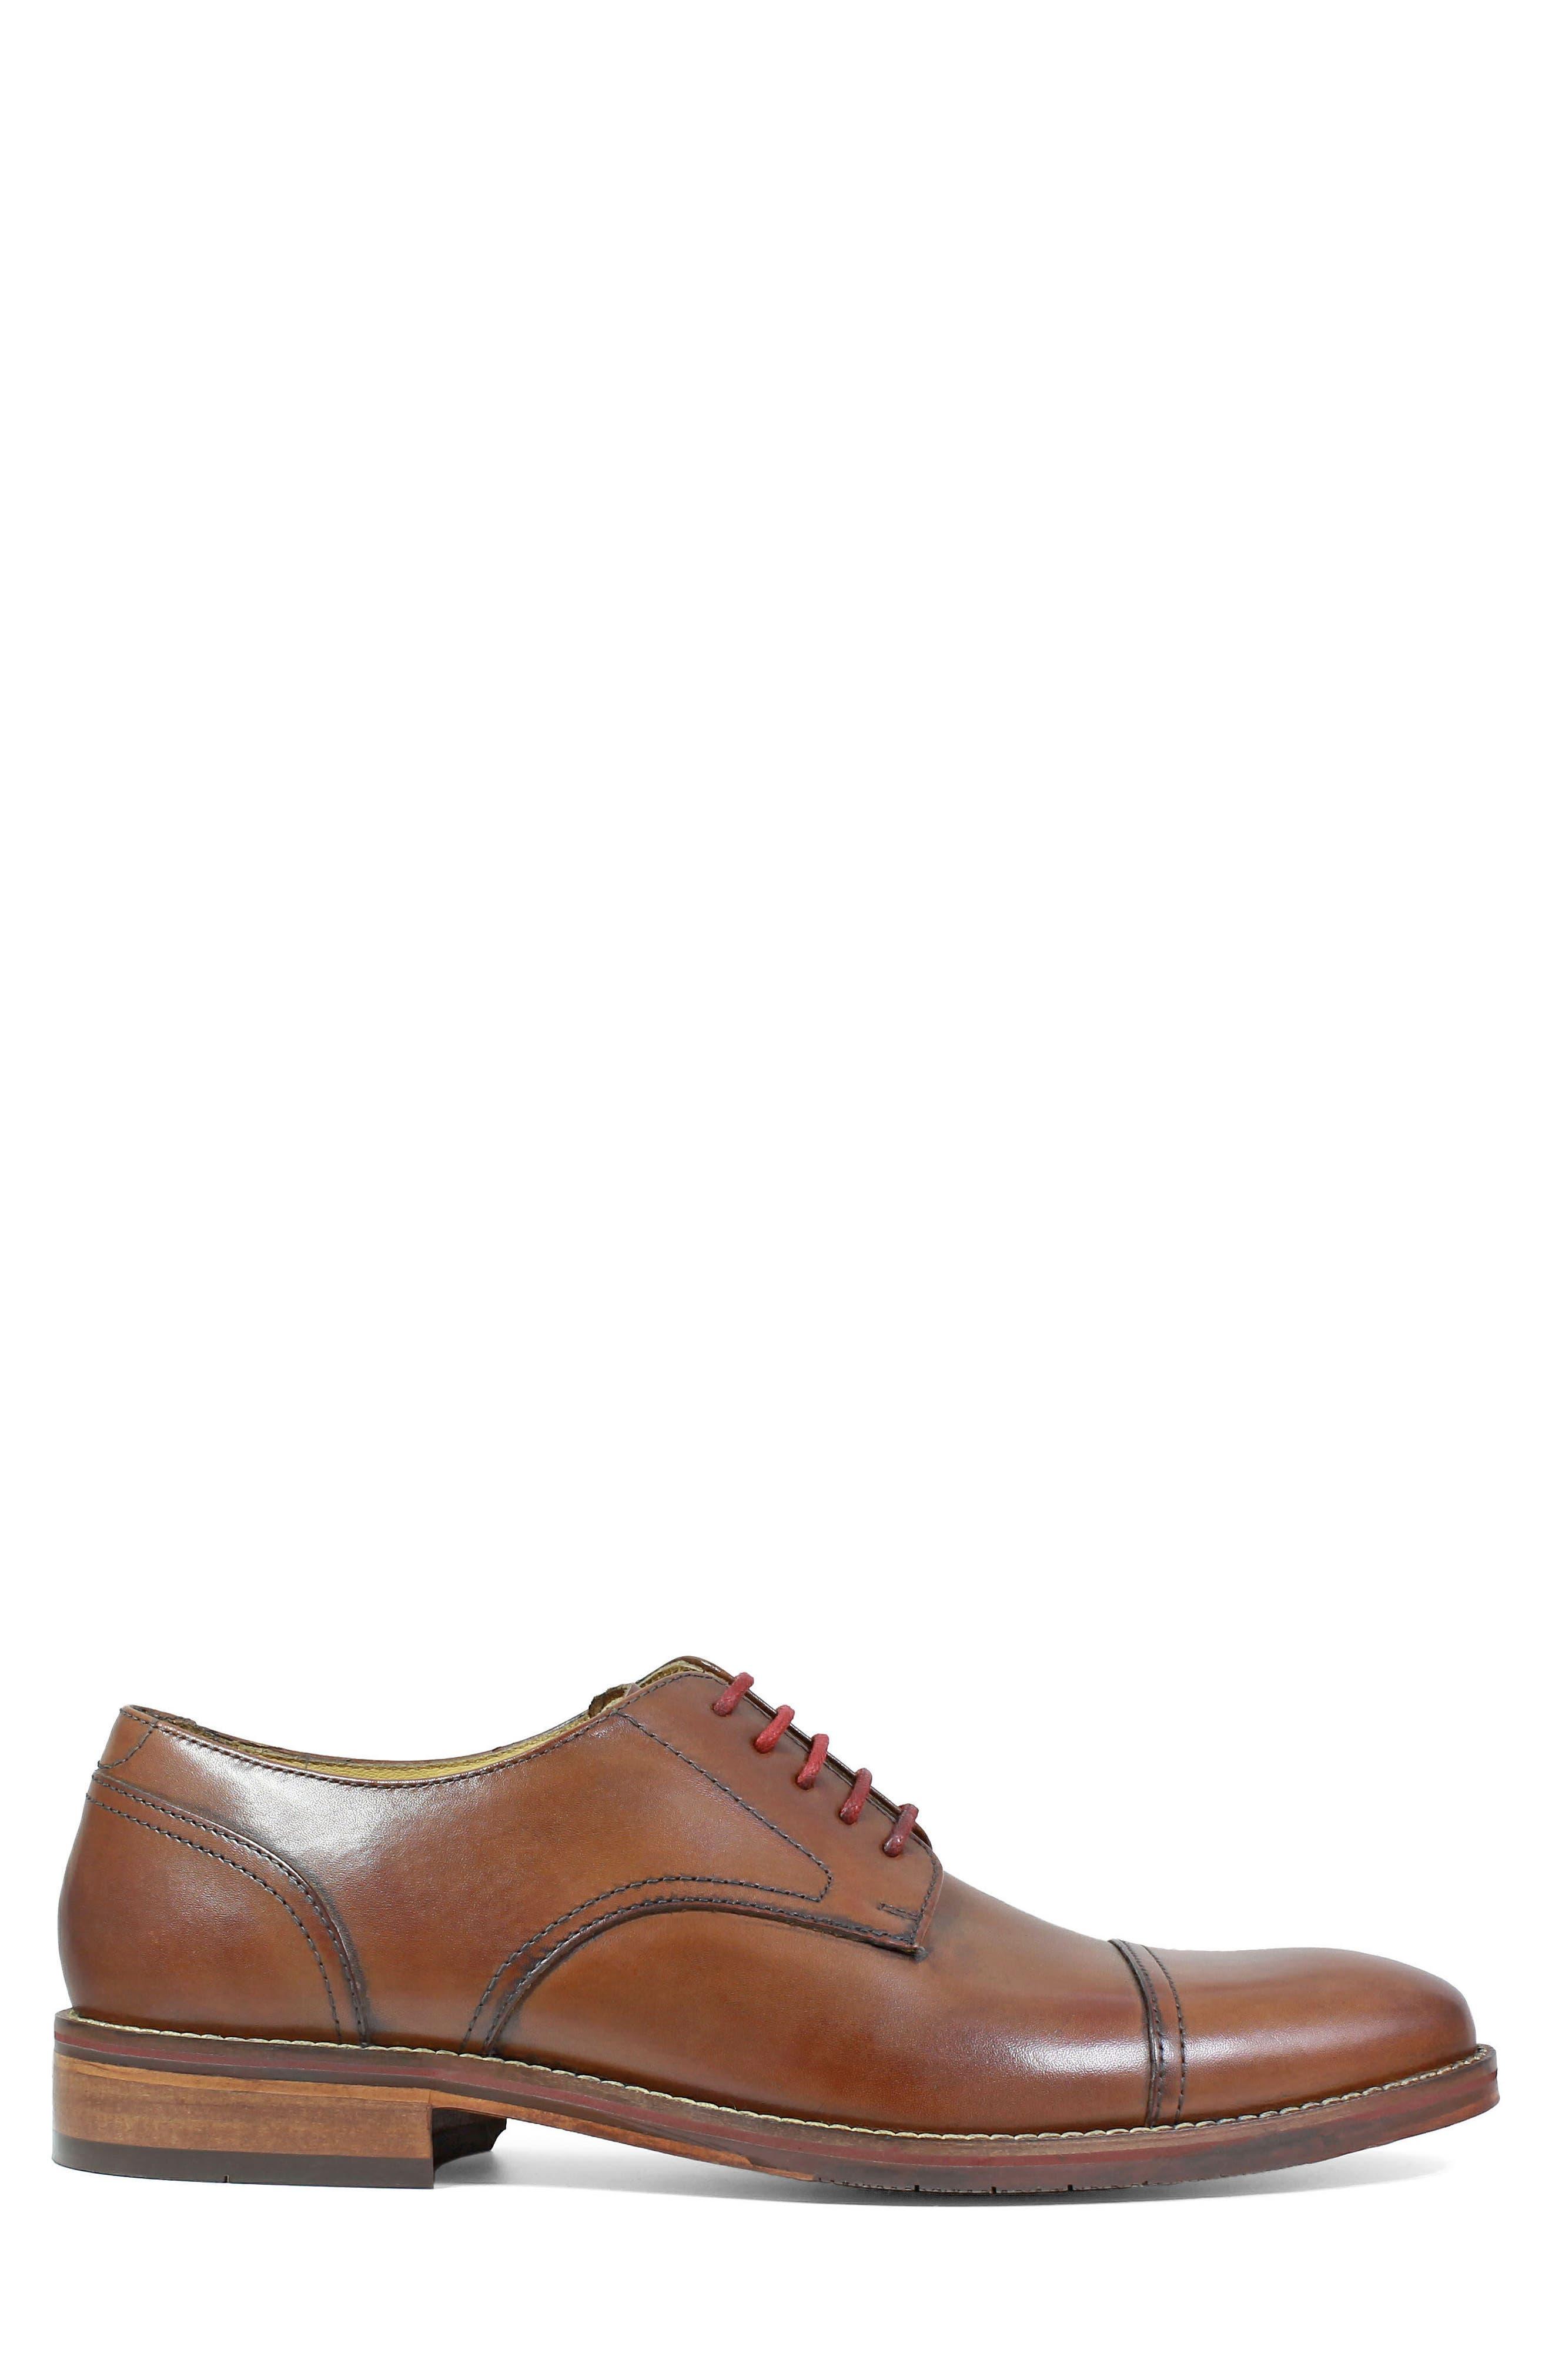 Salerno Wingtip,                             Alternate thumbnail 3, color,                             Cognac Leather